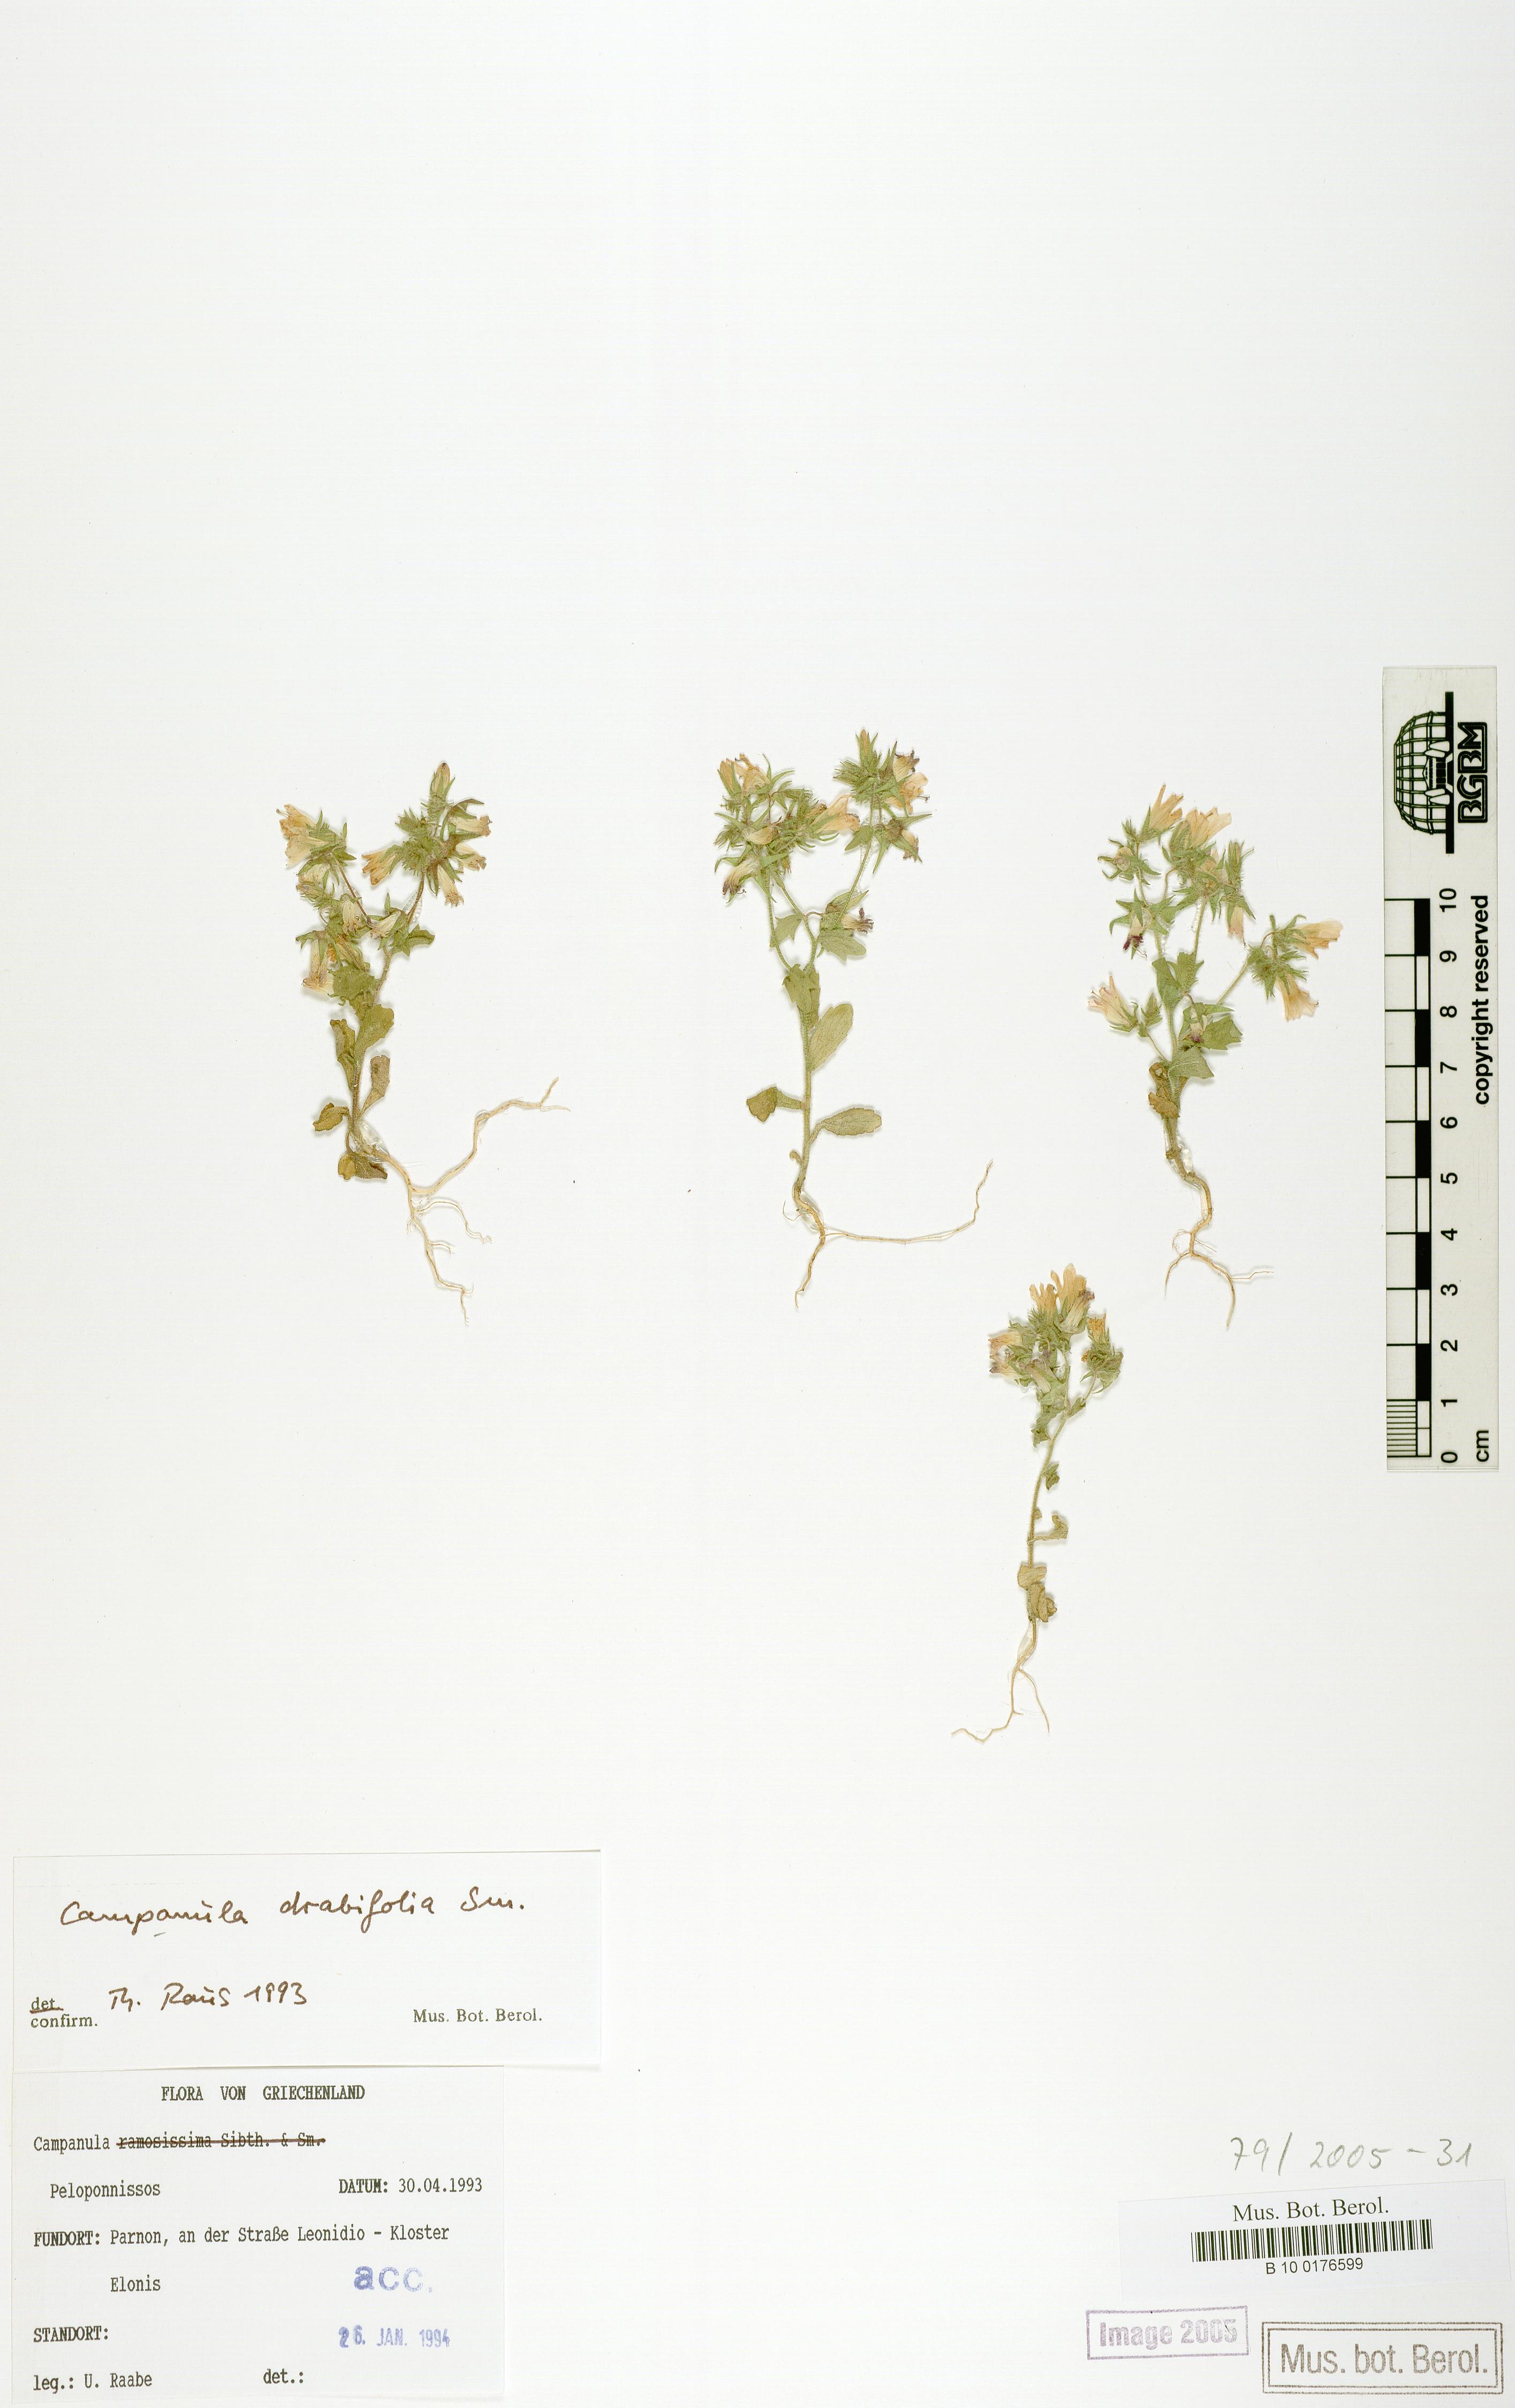 http://ww2.bgbm.org/herbarium/images/B/10/01/76/59/B_10_0176599.jpg